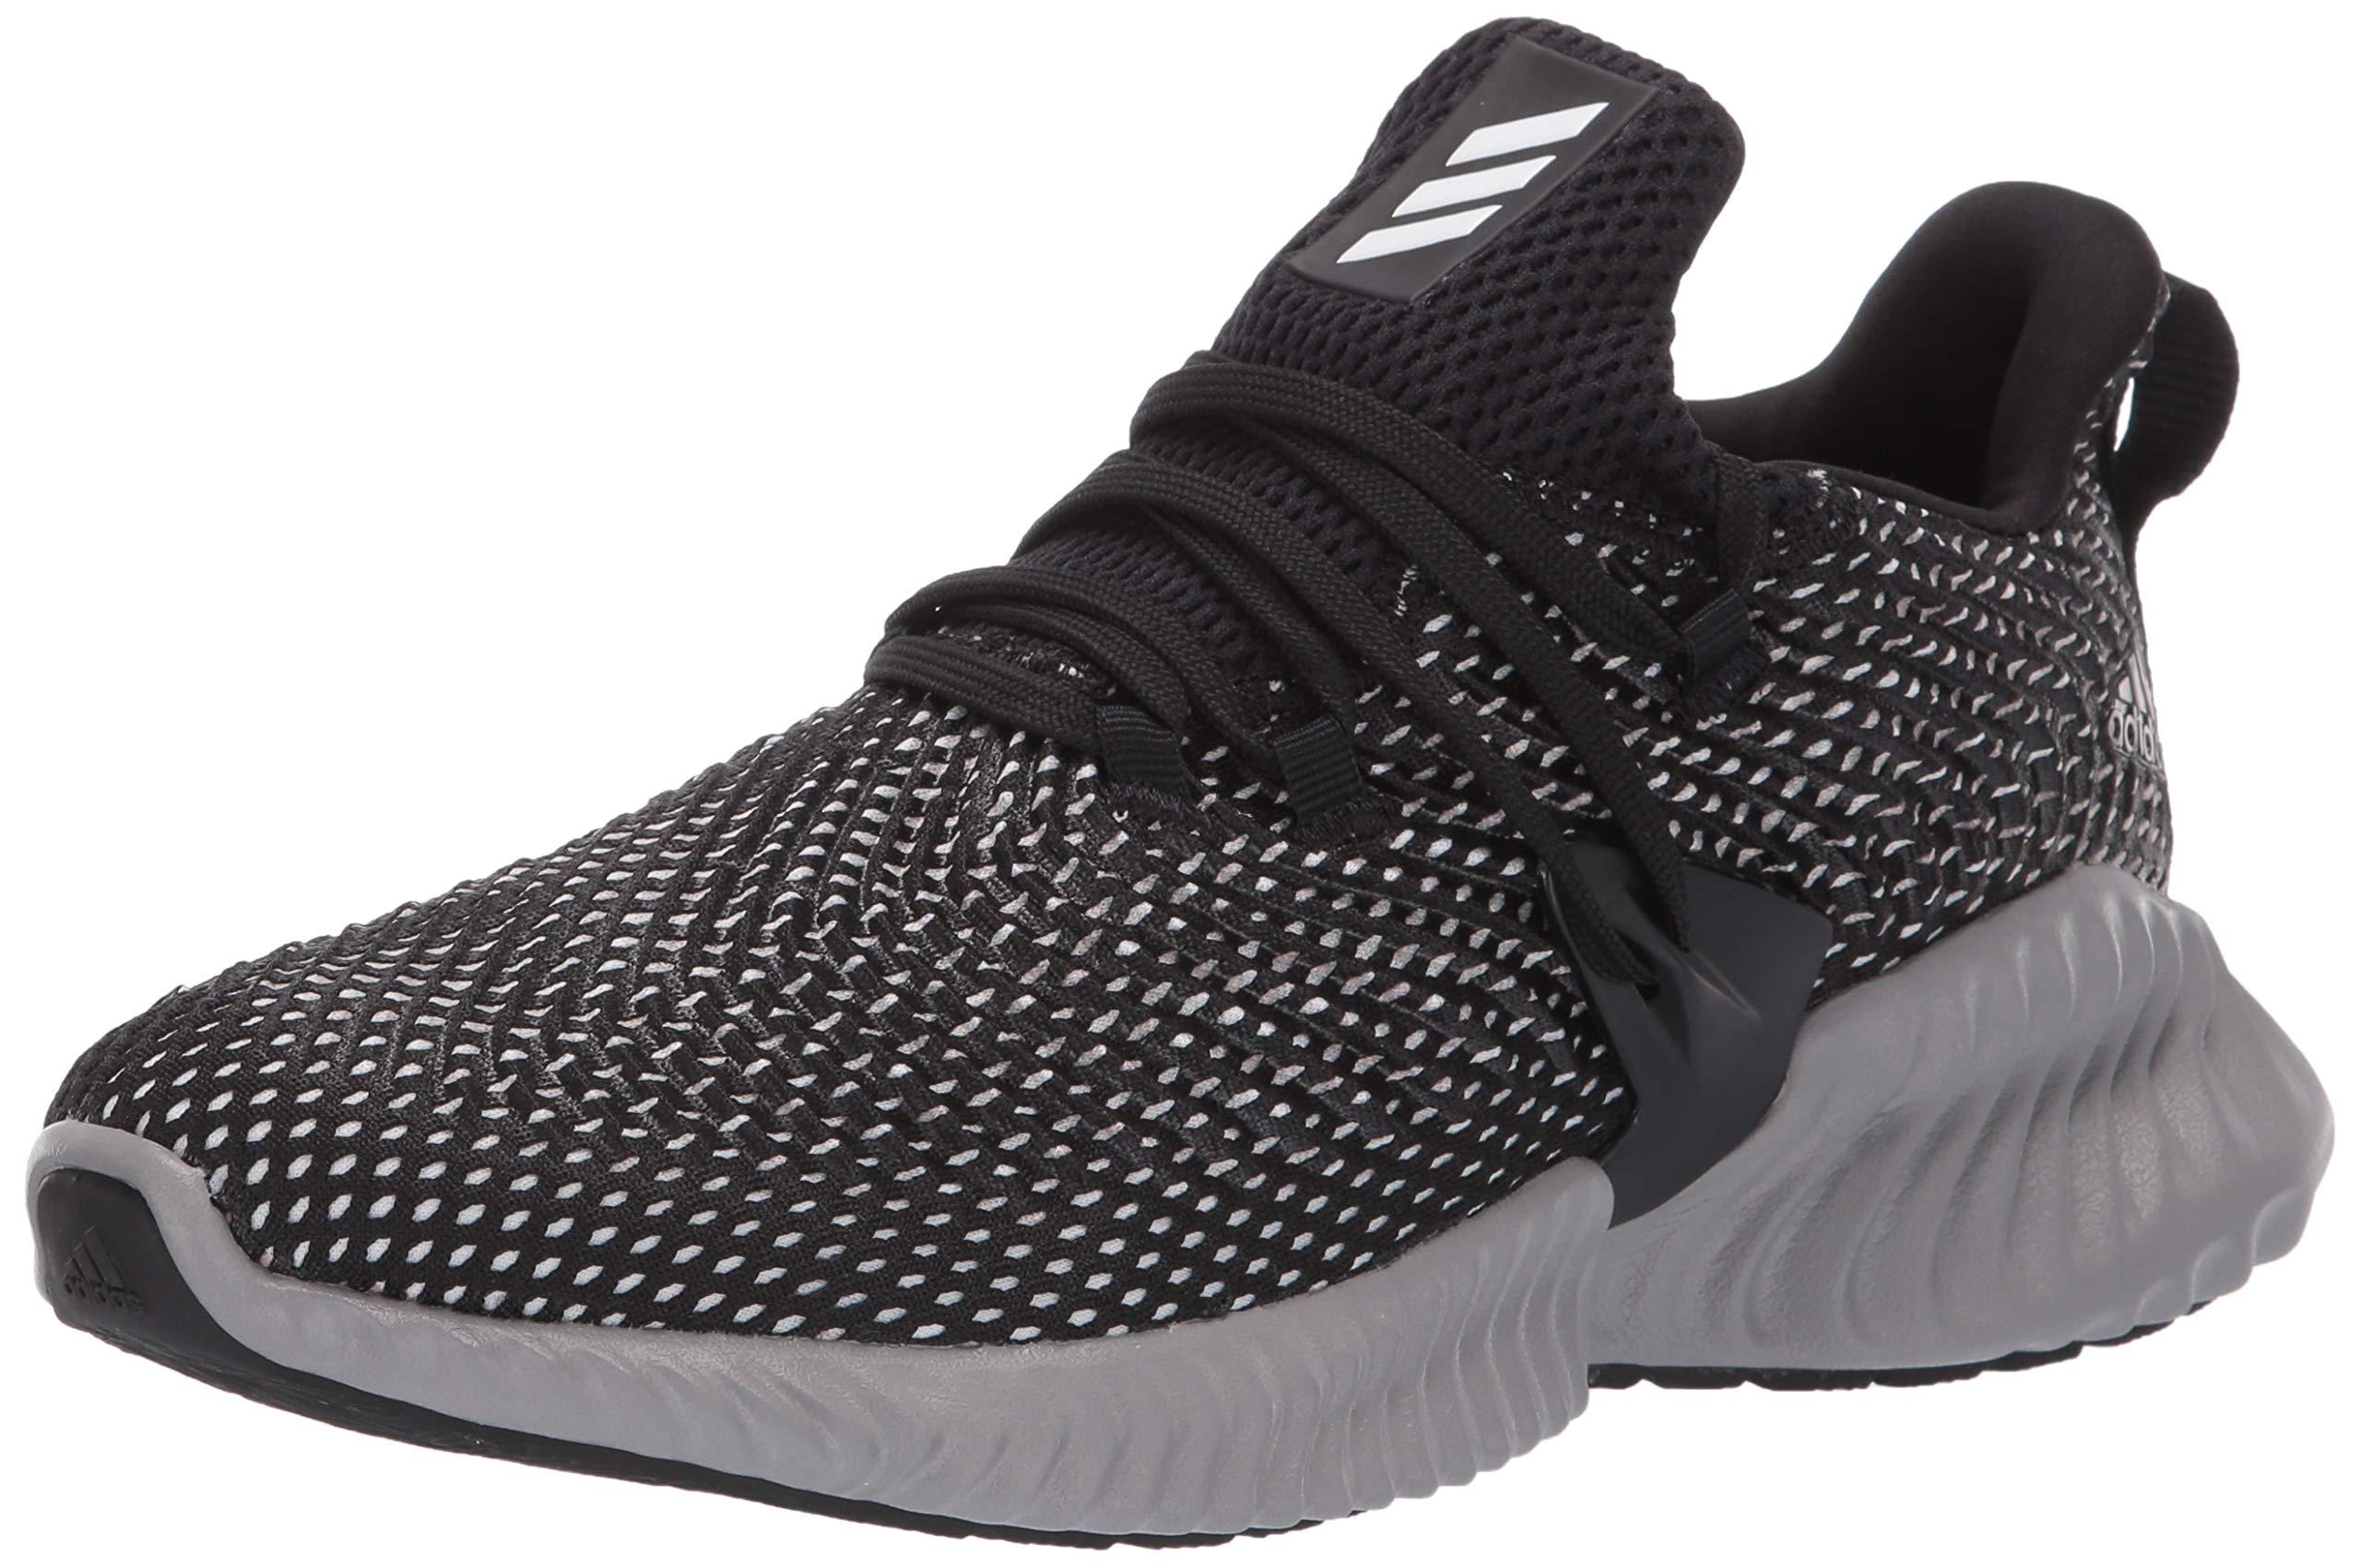 Adidas Kids Alphabounce Instinct, Black/White/Grey, 1 M US Little Kid by adidas (Image #1)